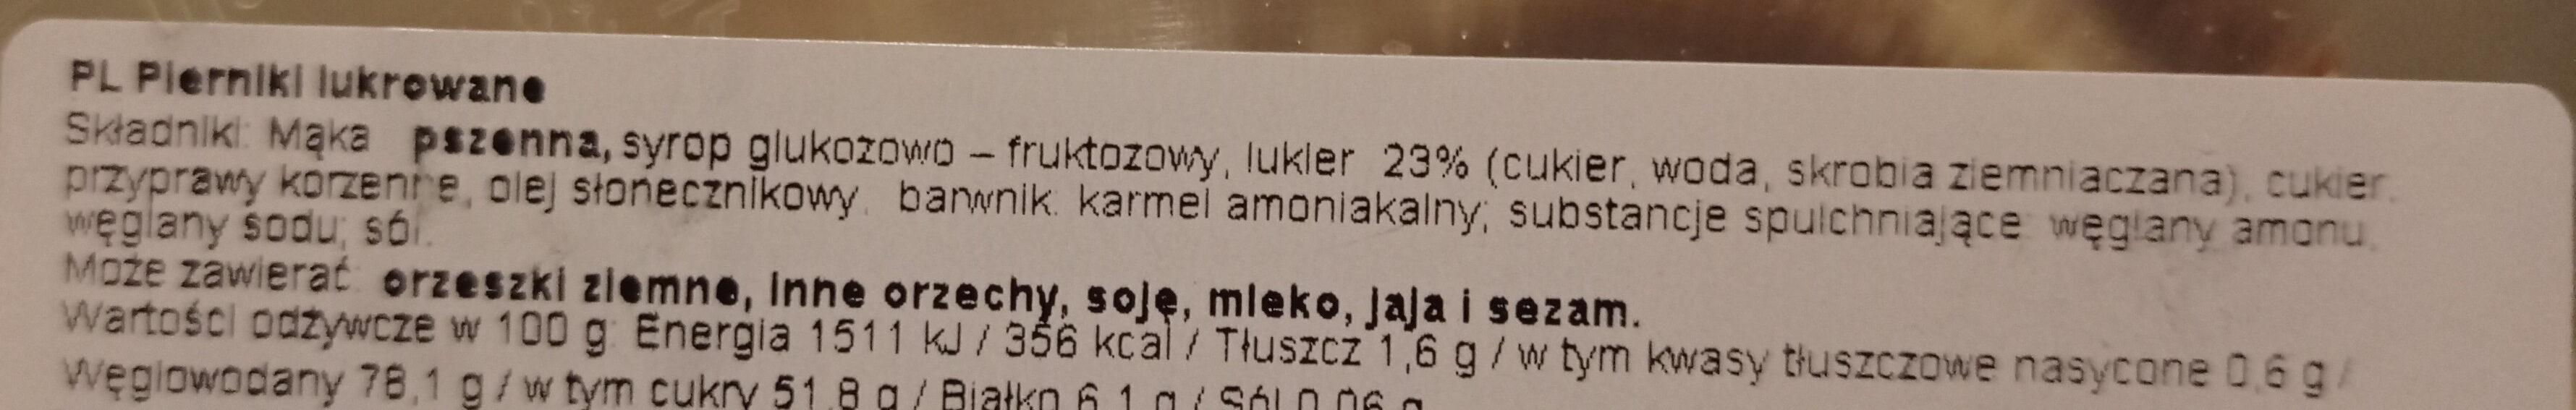 piekarniki lukrowane - Składniki - pl